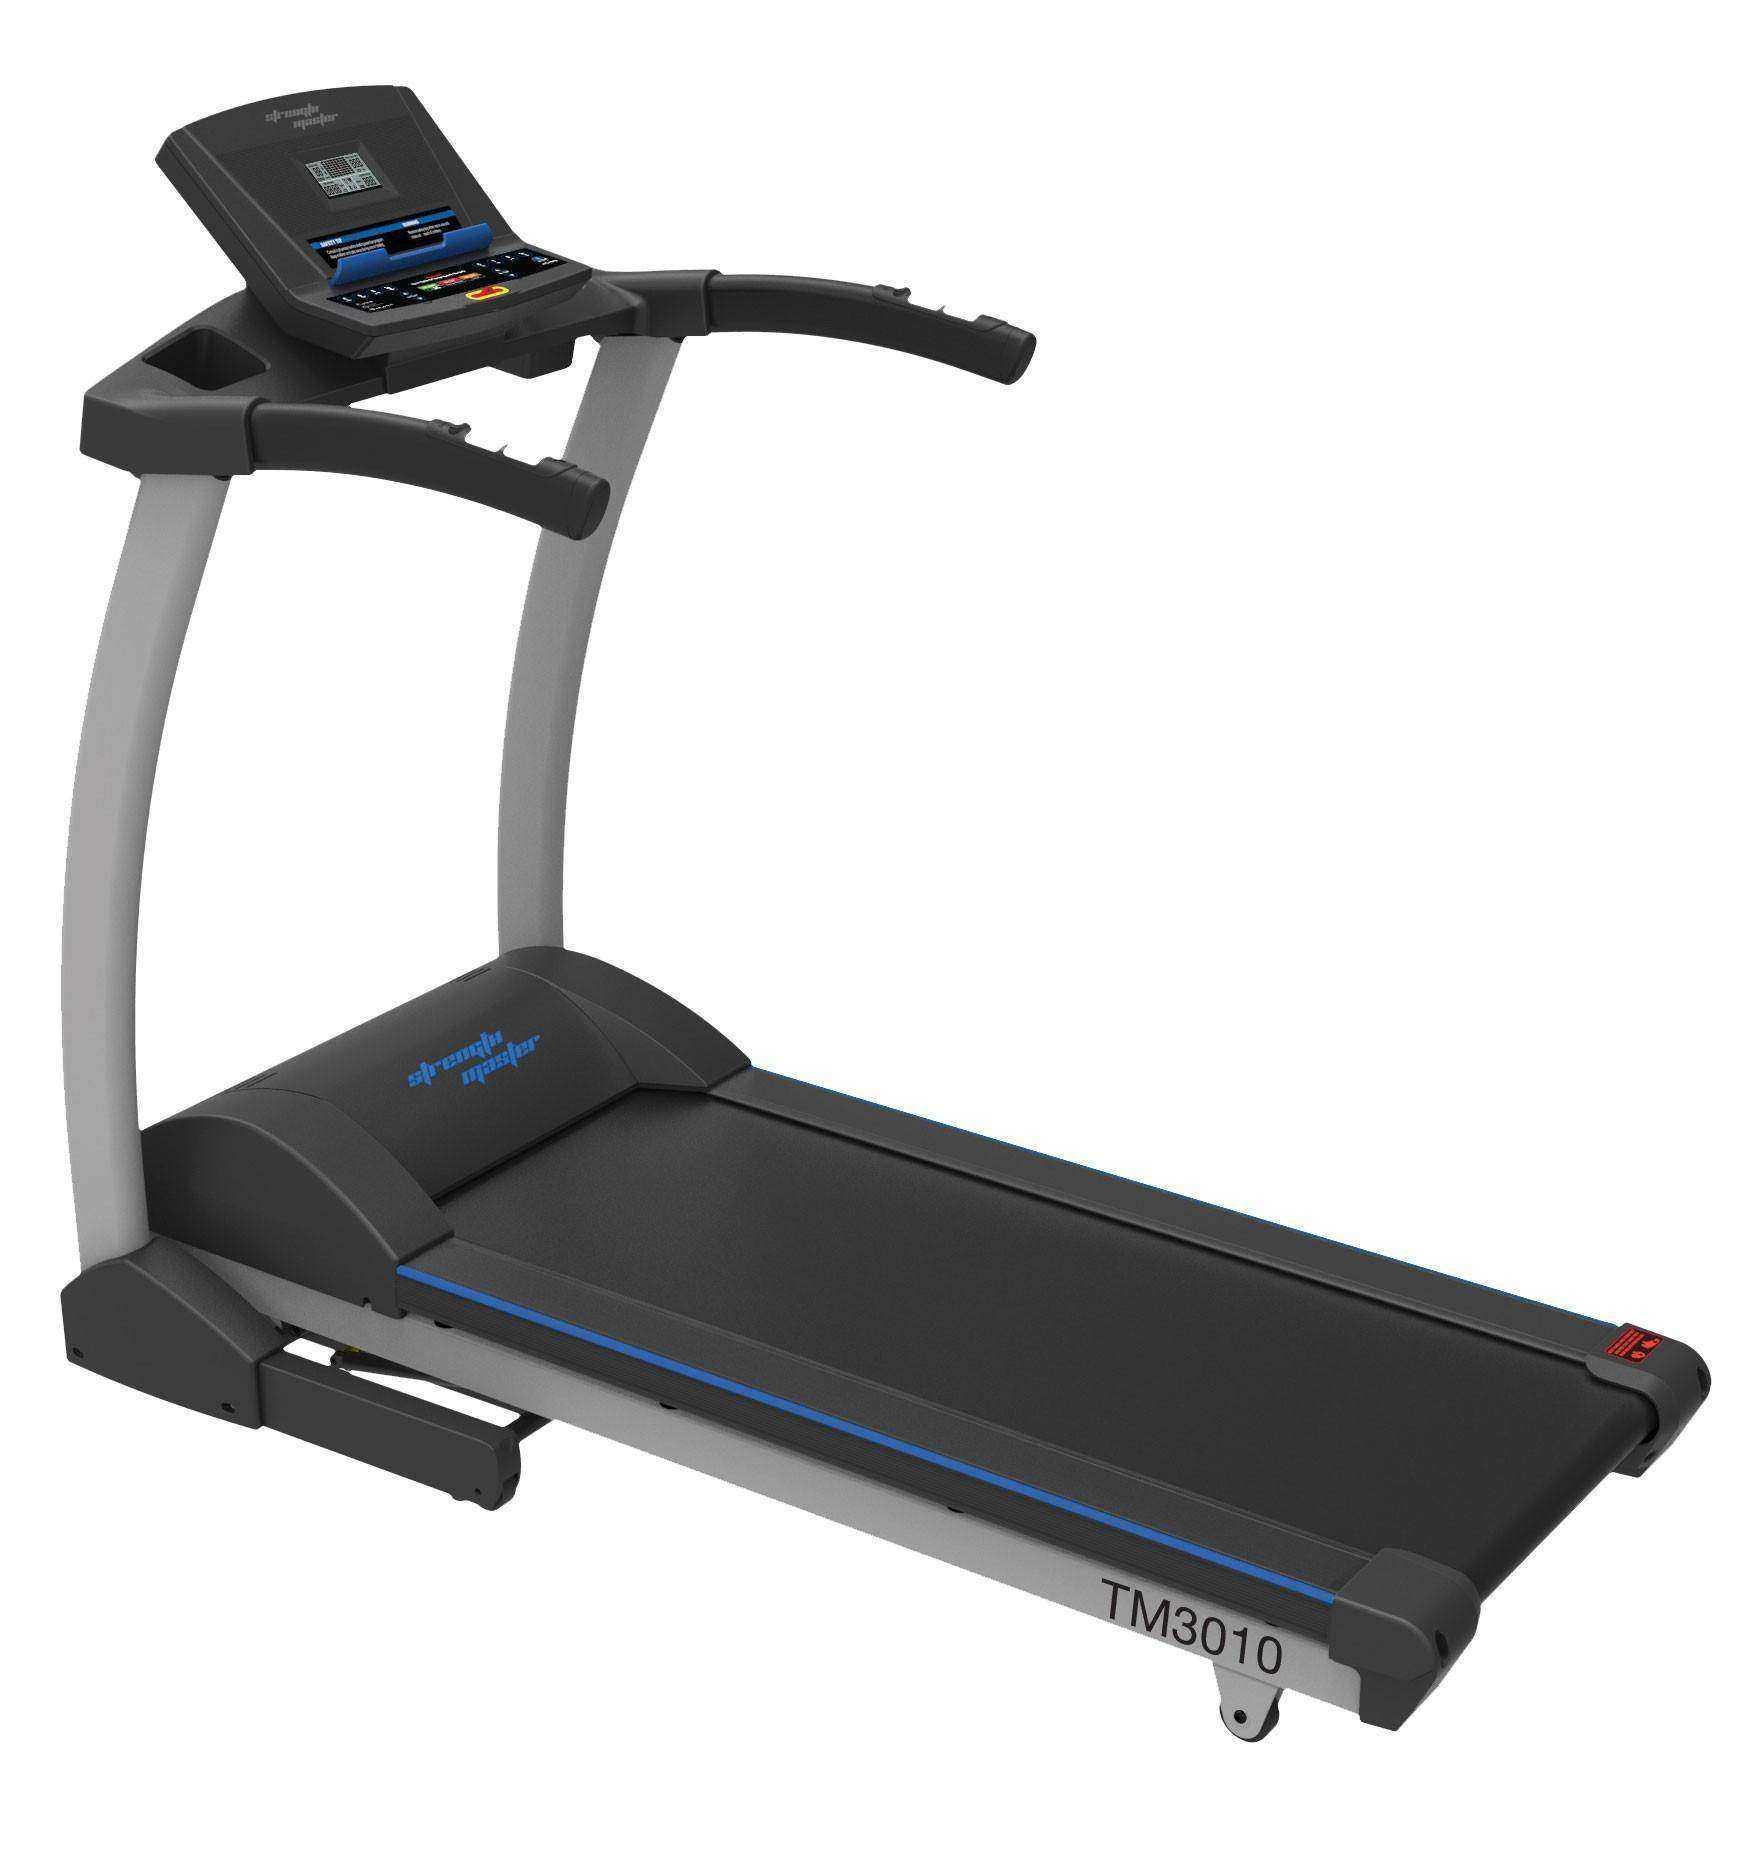 Lifespan Treadmill Js S5002: Lifespan Motorised Treadmill